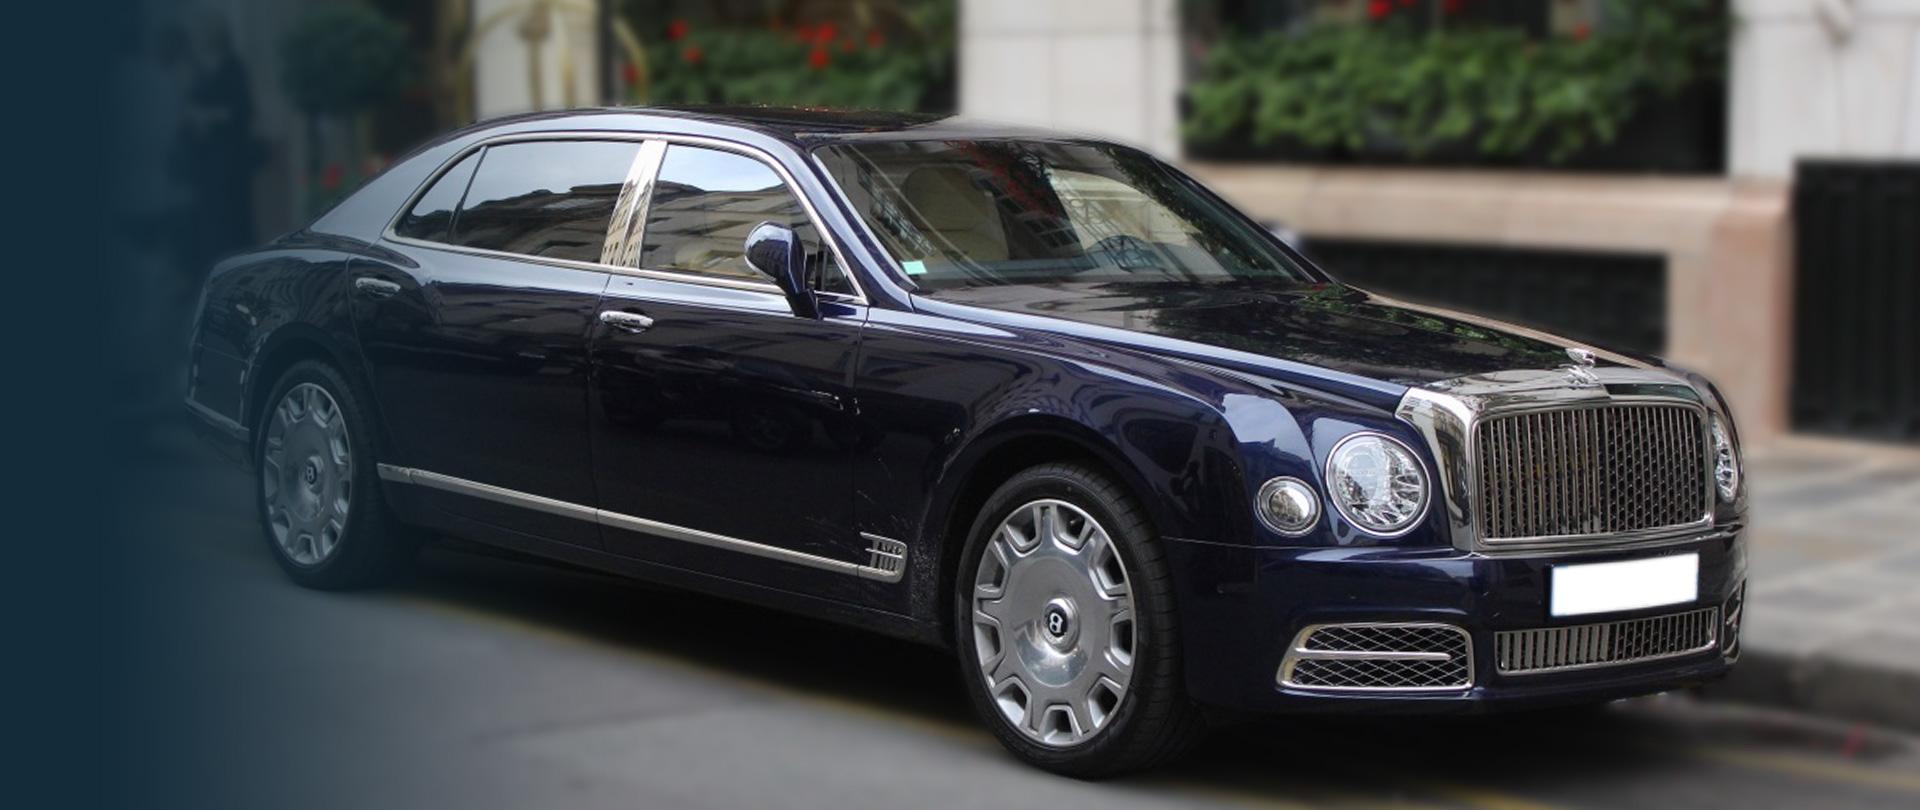 Executive Cars Chauffeur London Kelly